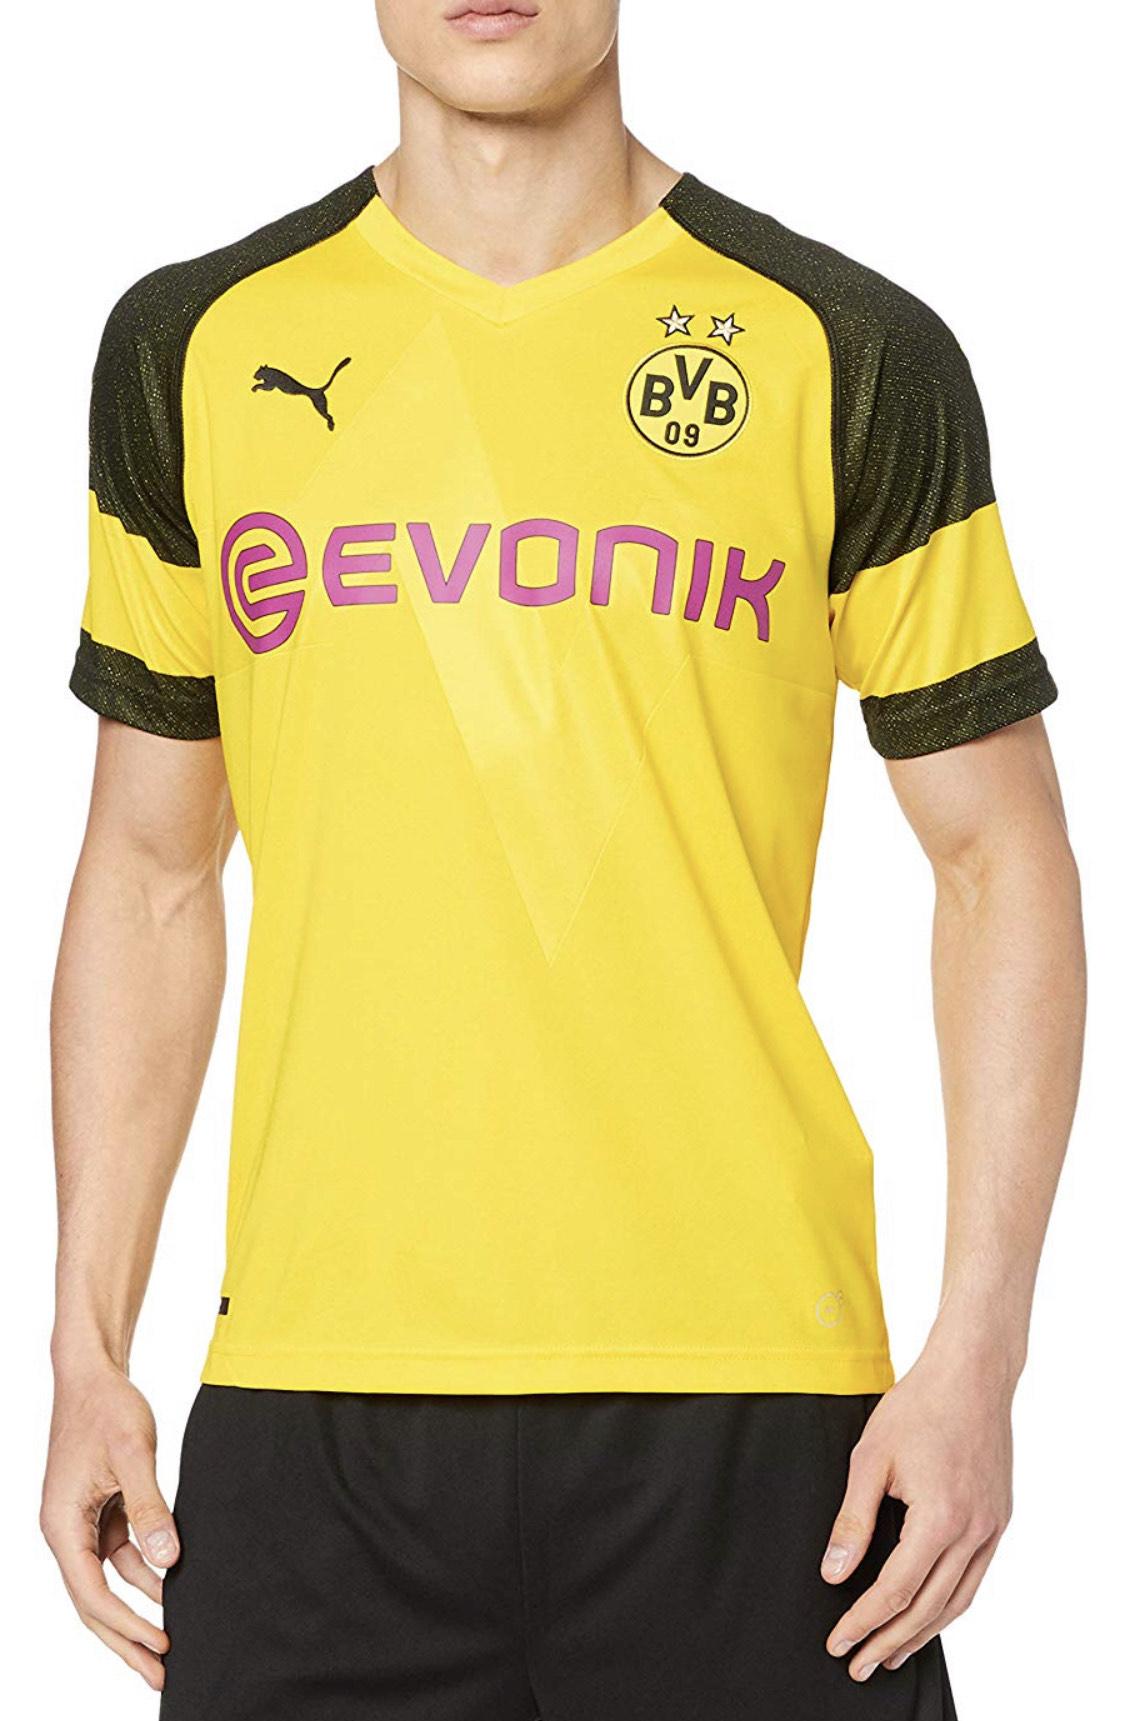 Camiseta Borussia Dortmund talla L